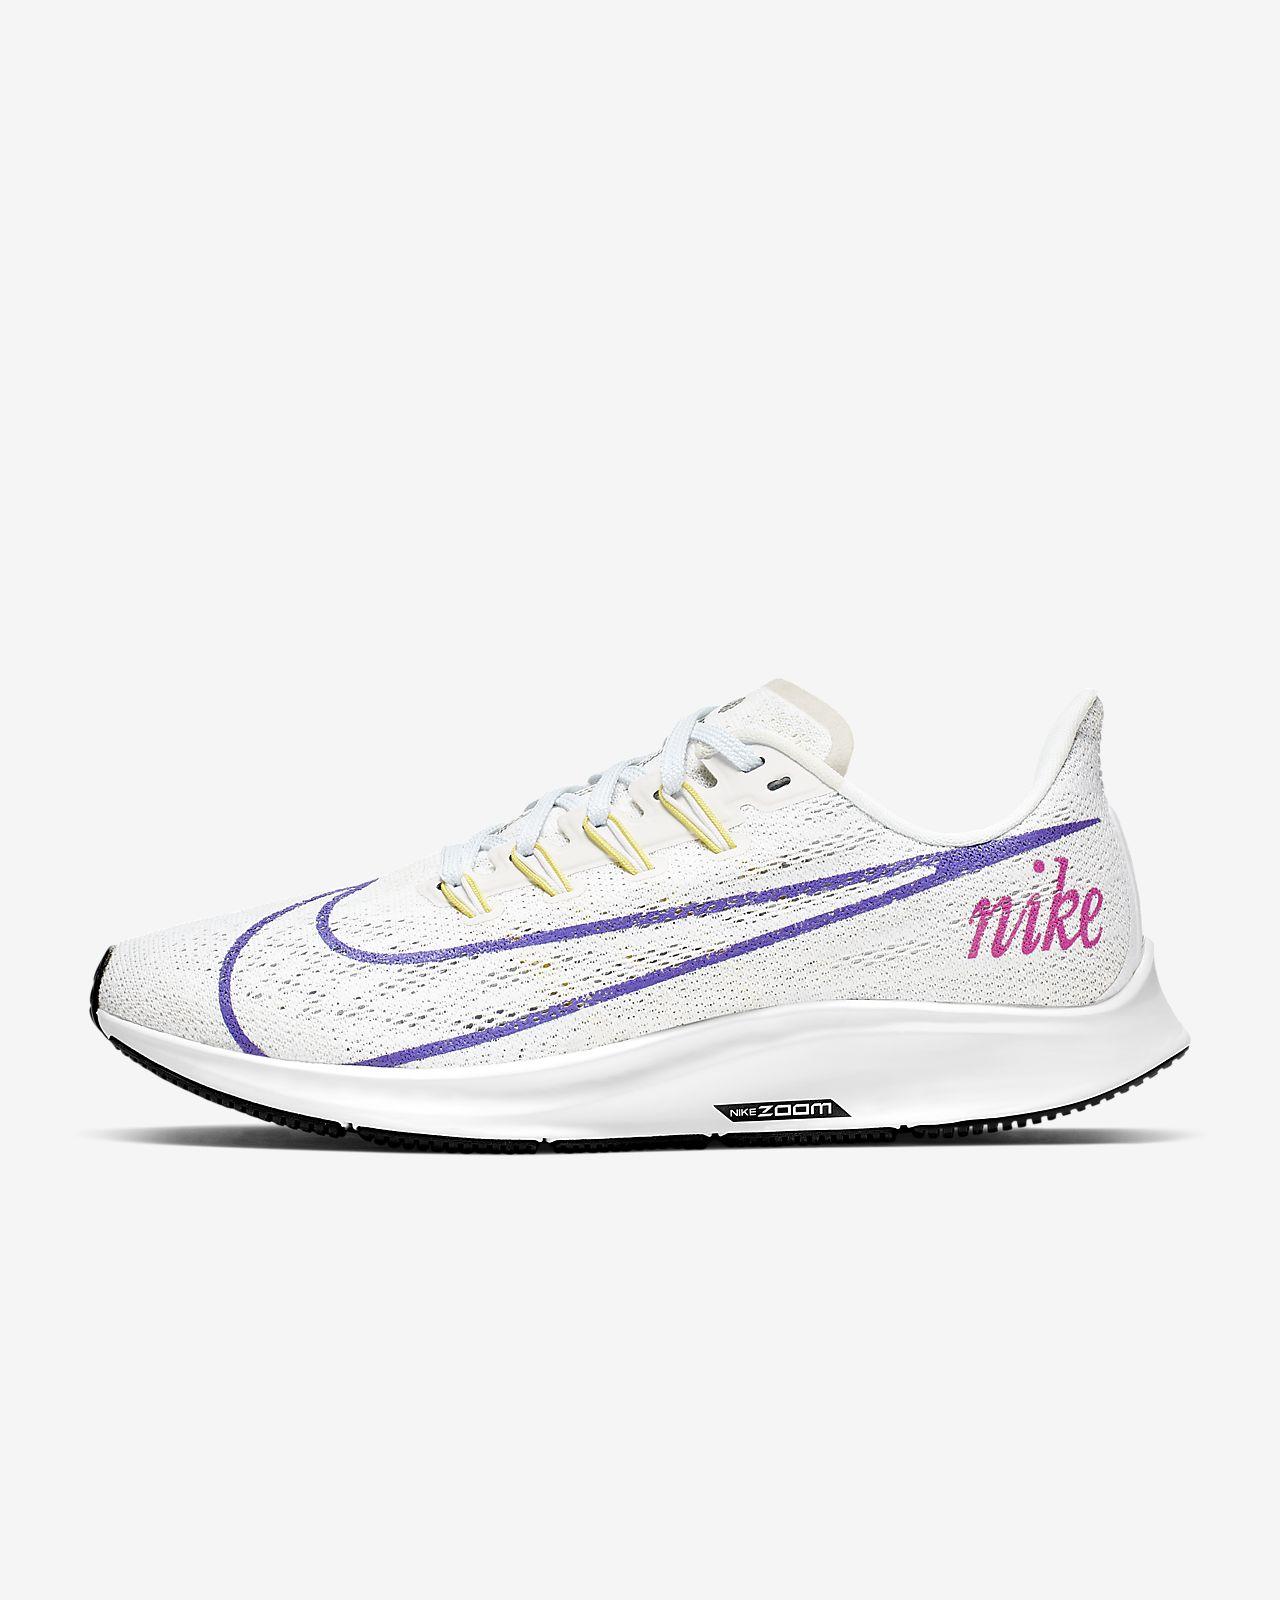 Chaussure de running Nike Air Zoom Pegasus 36 pour Femme